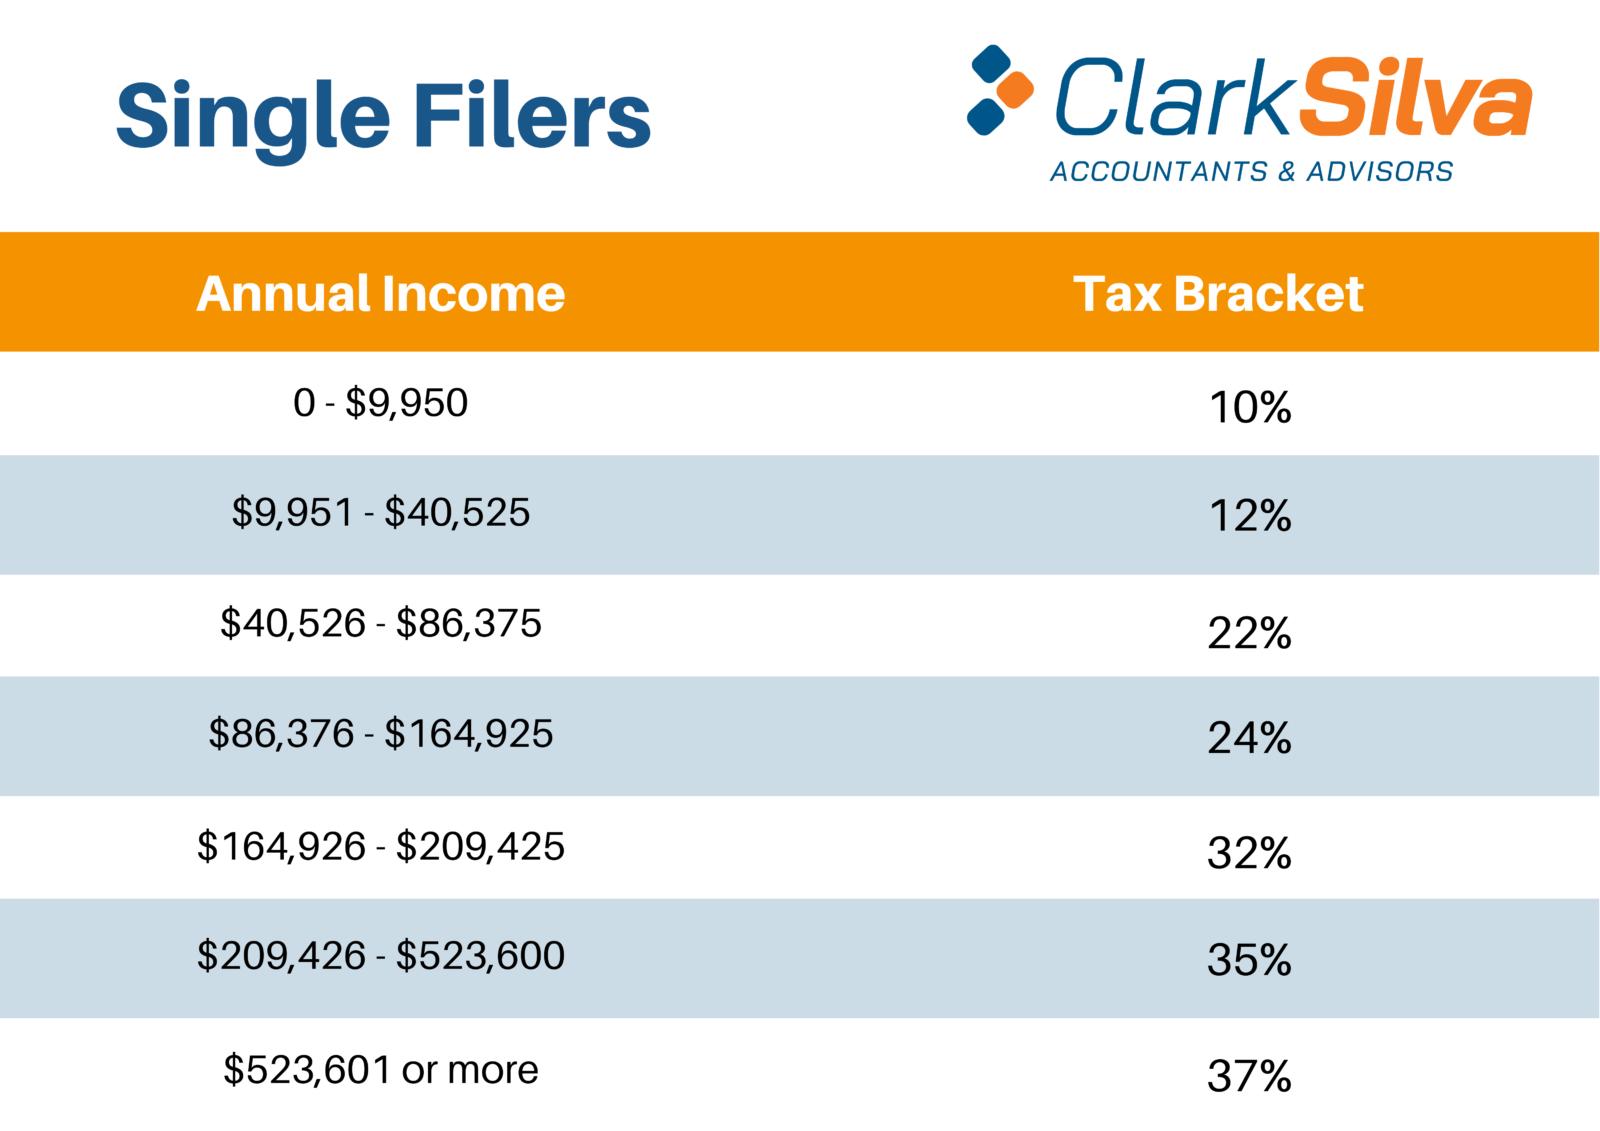 2021 Tax Bracket - Single Filers